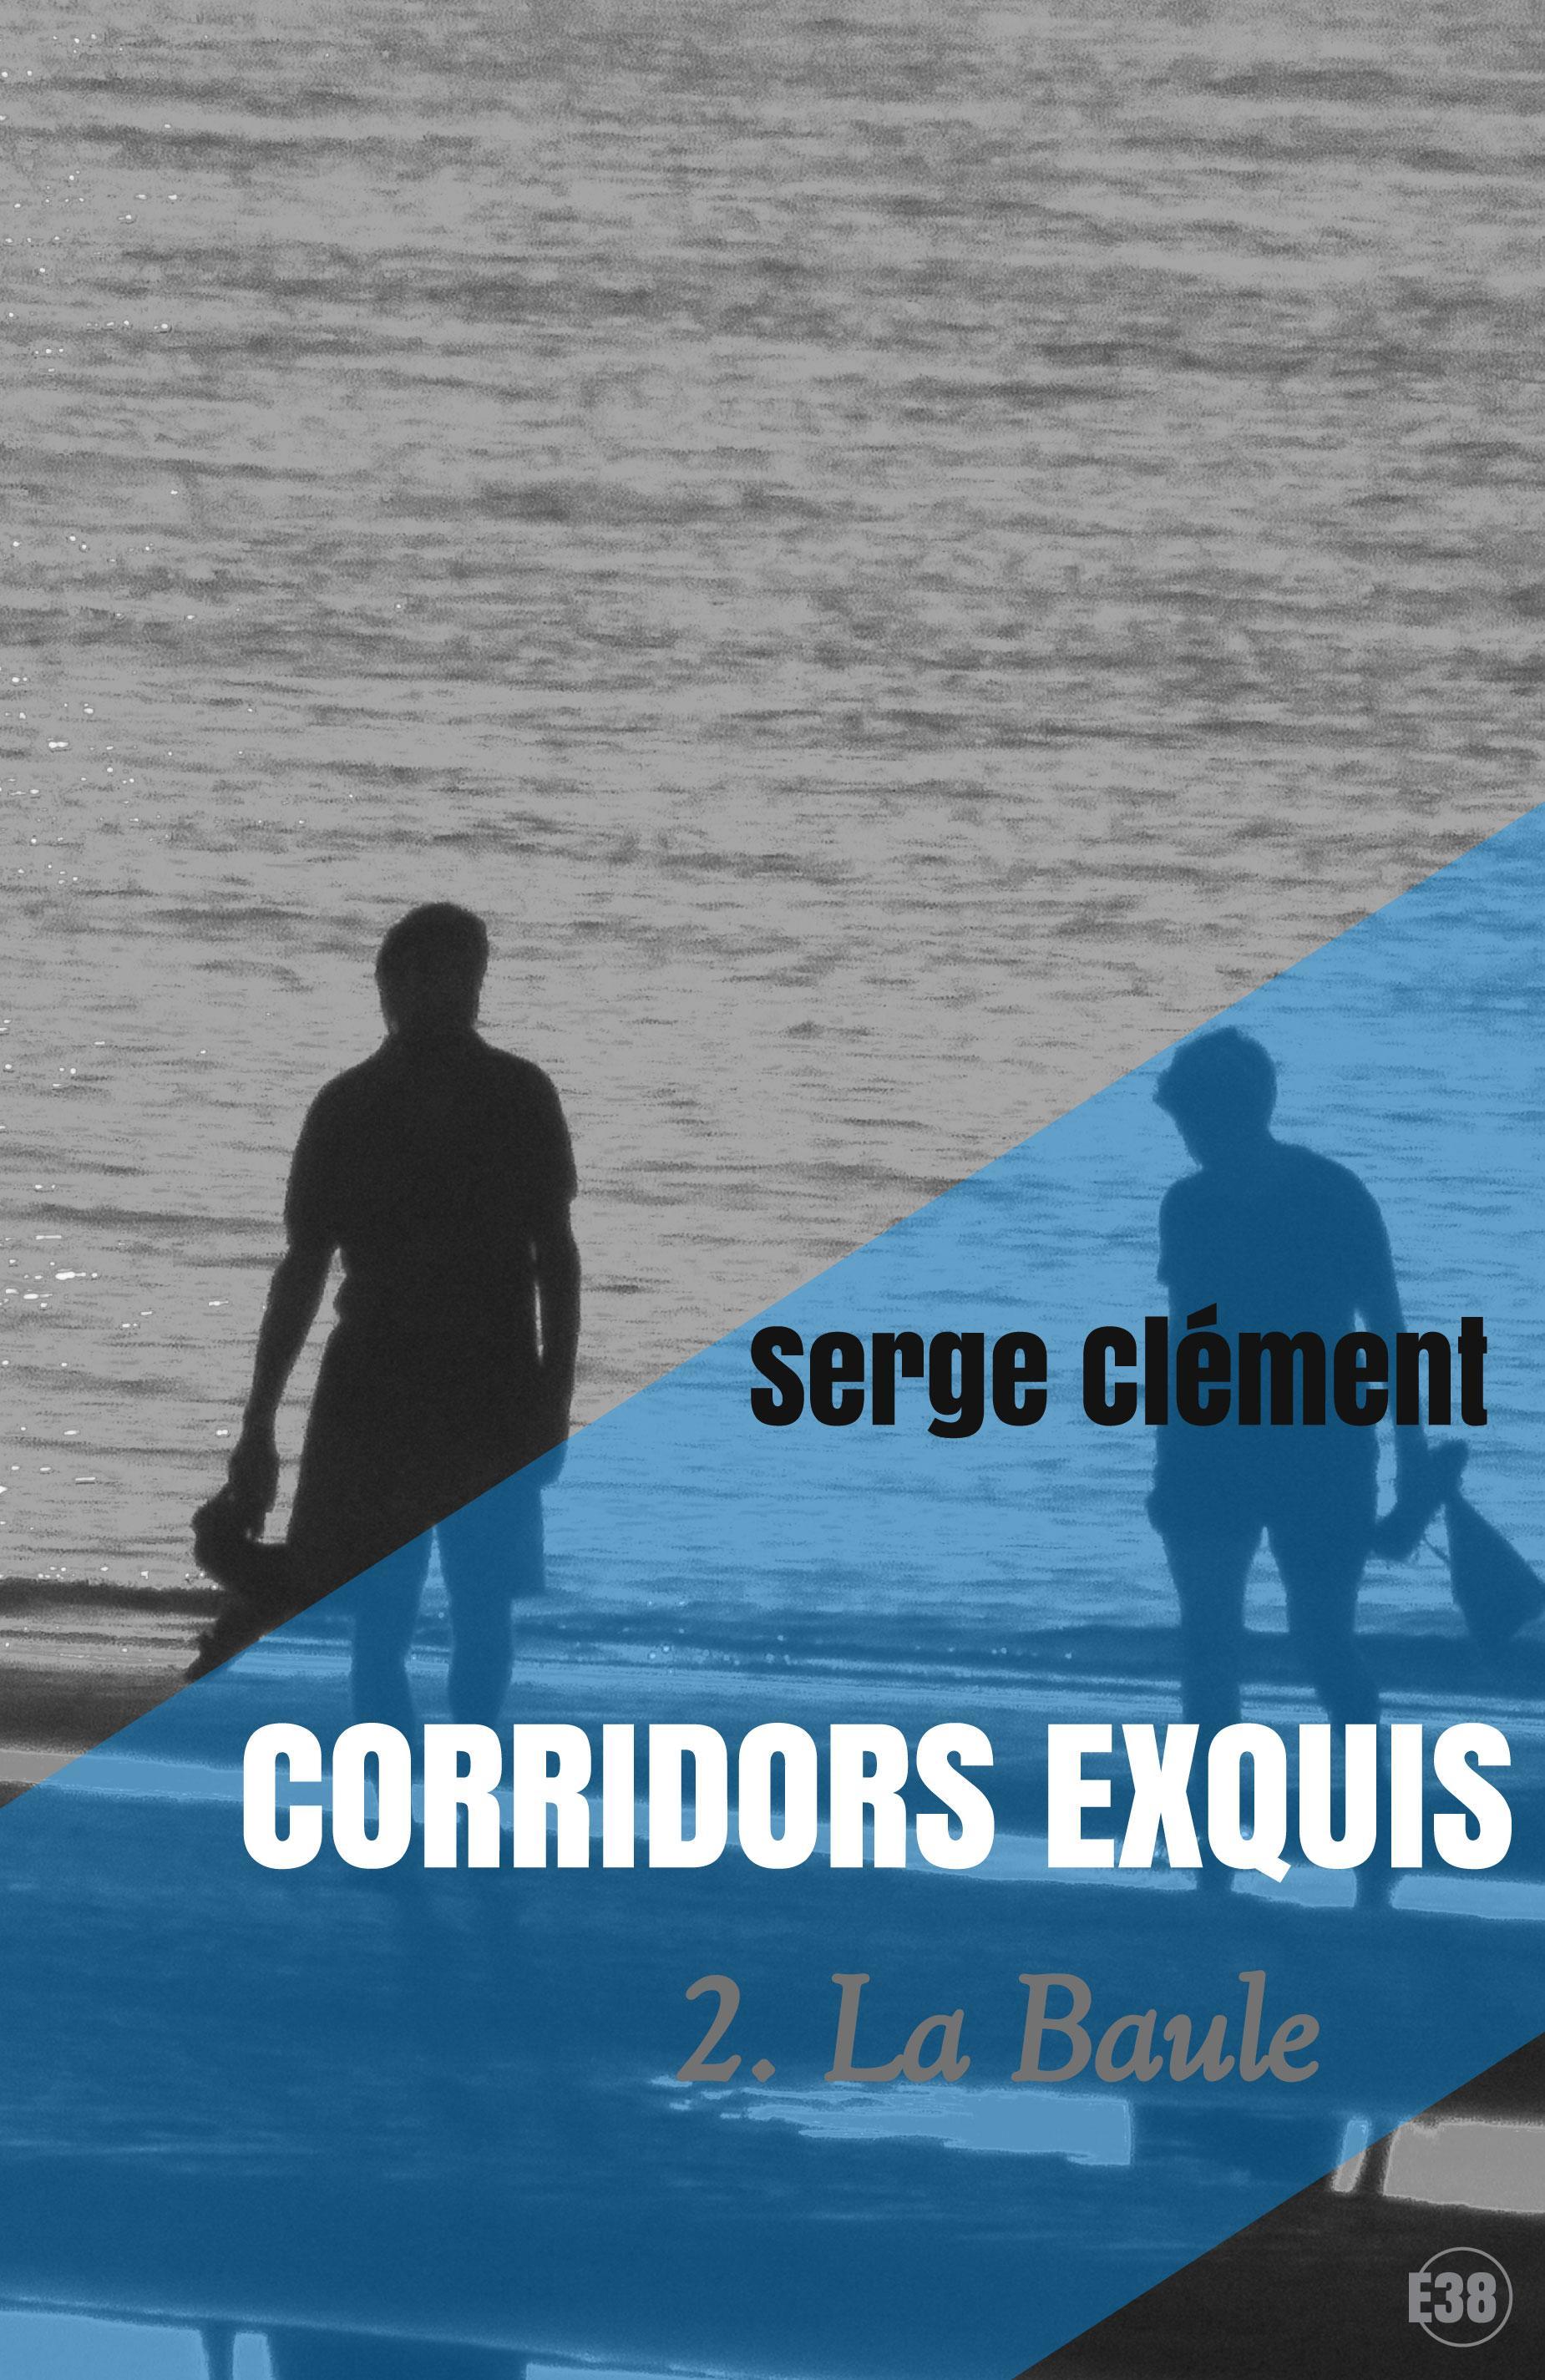 Corridors exquis 2, La Baule